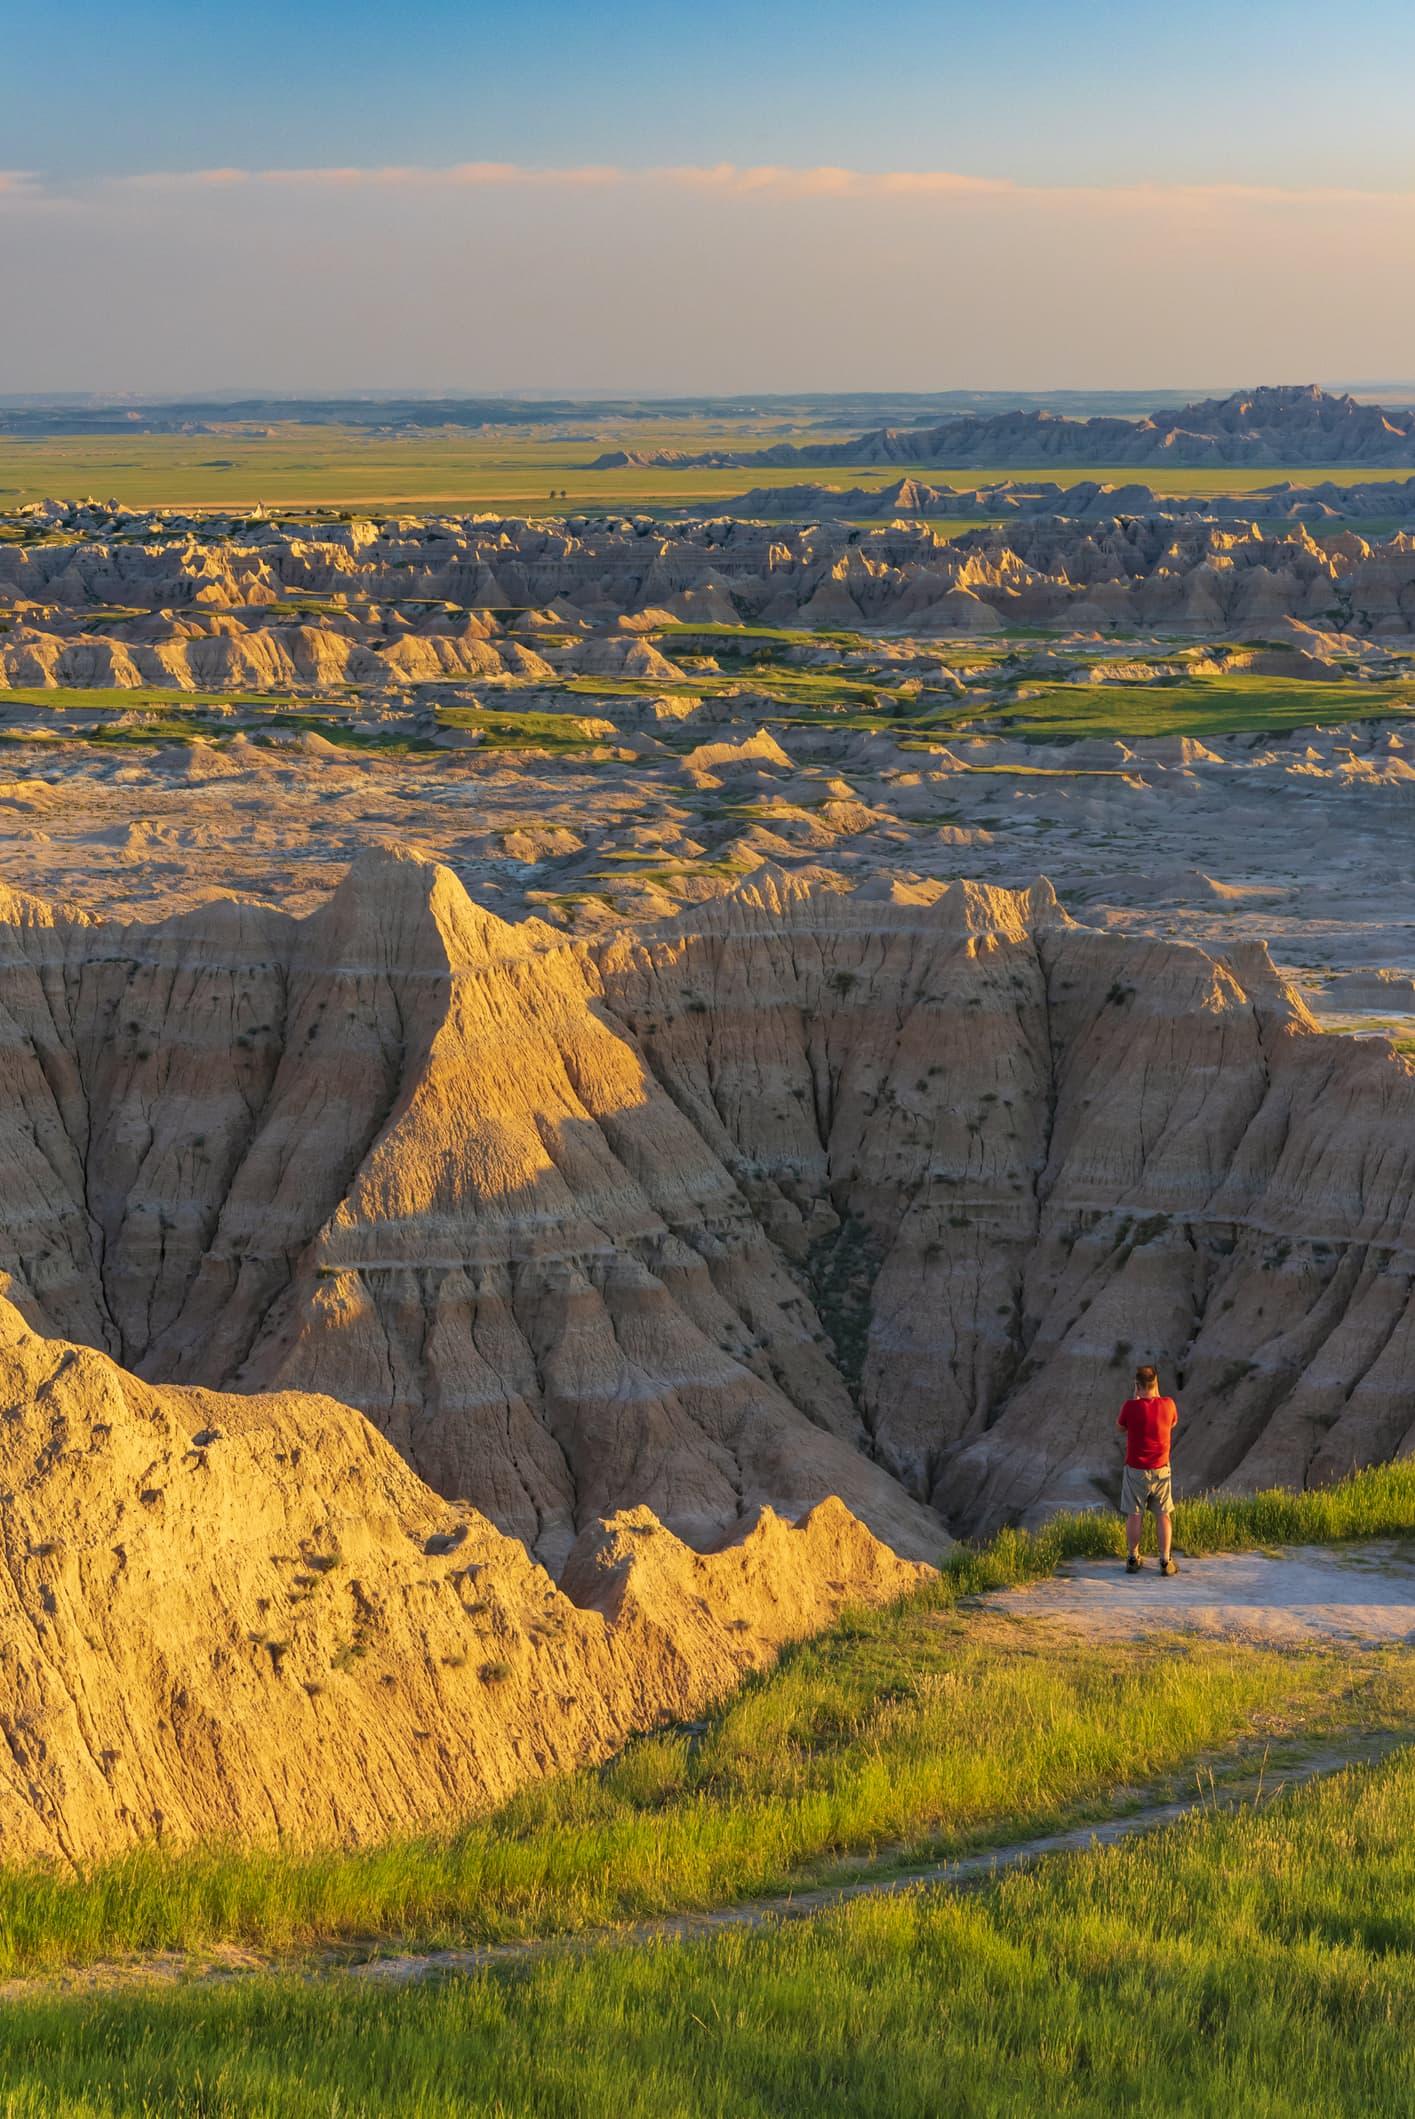 Single male photographer looks across the rocky Badlands at sunset, South Dakota, Nebraska. USA